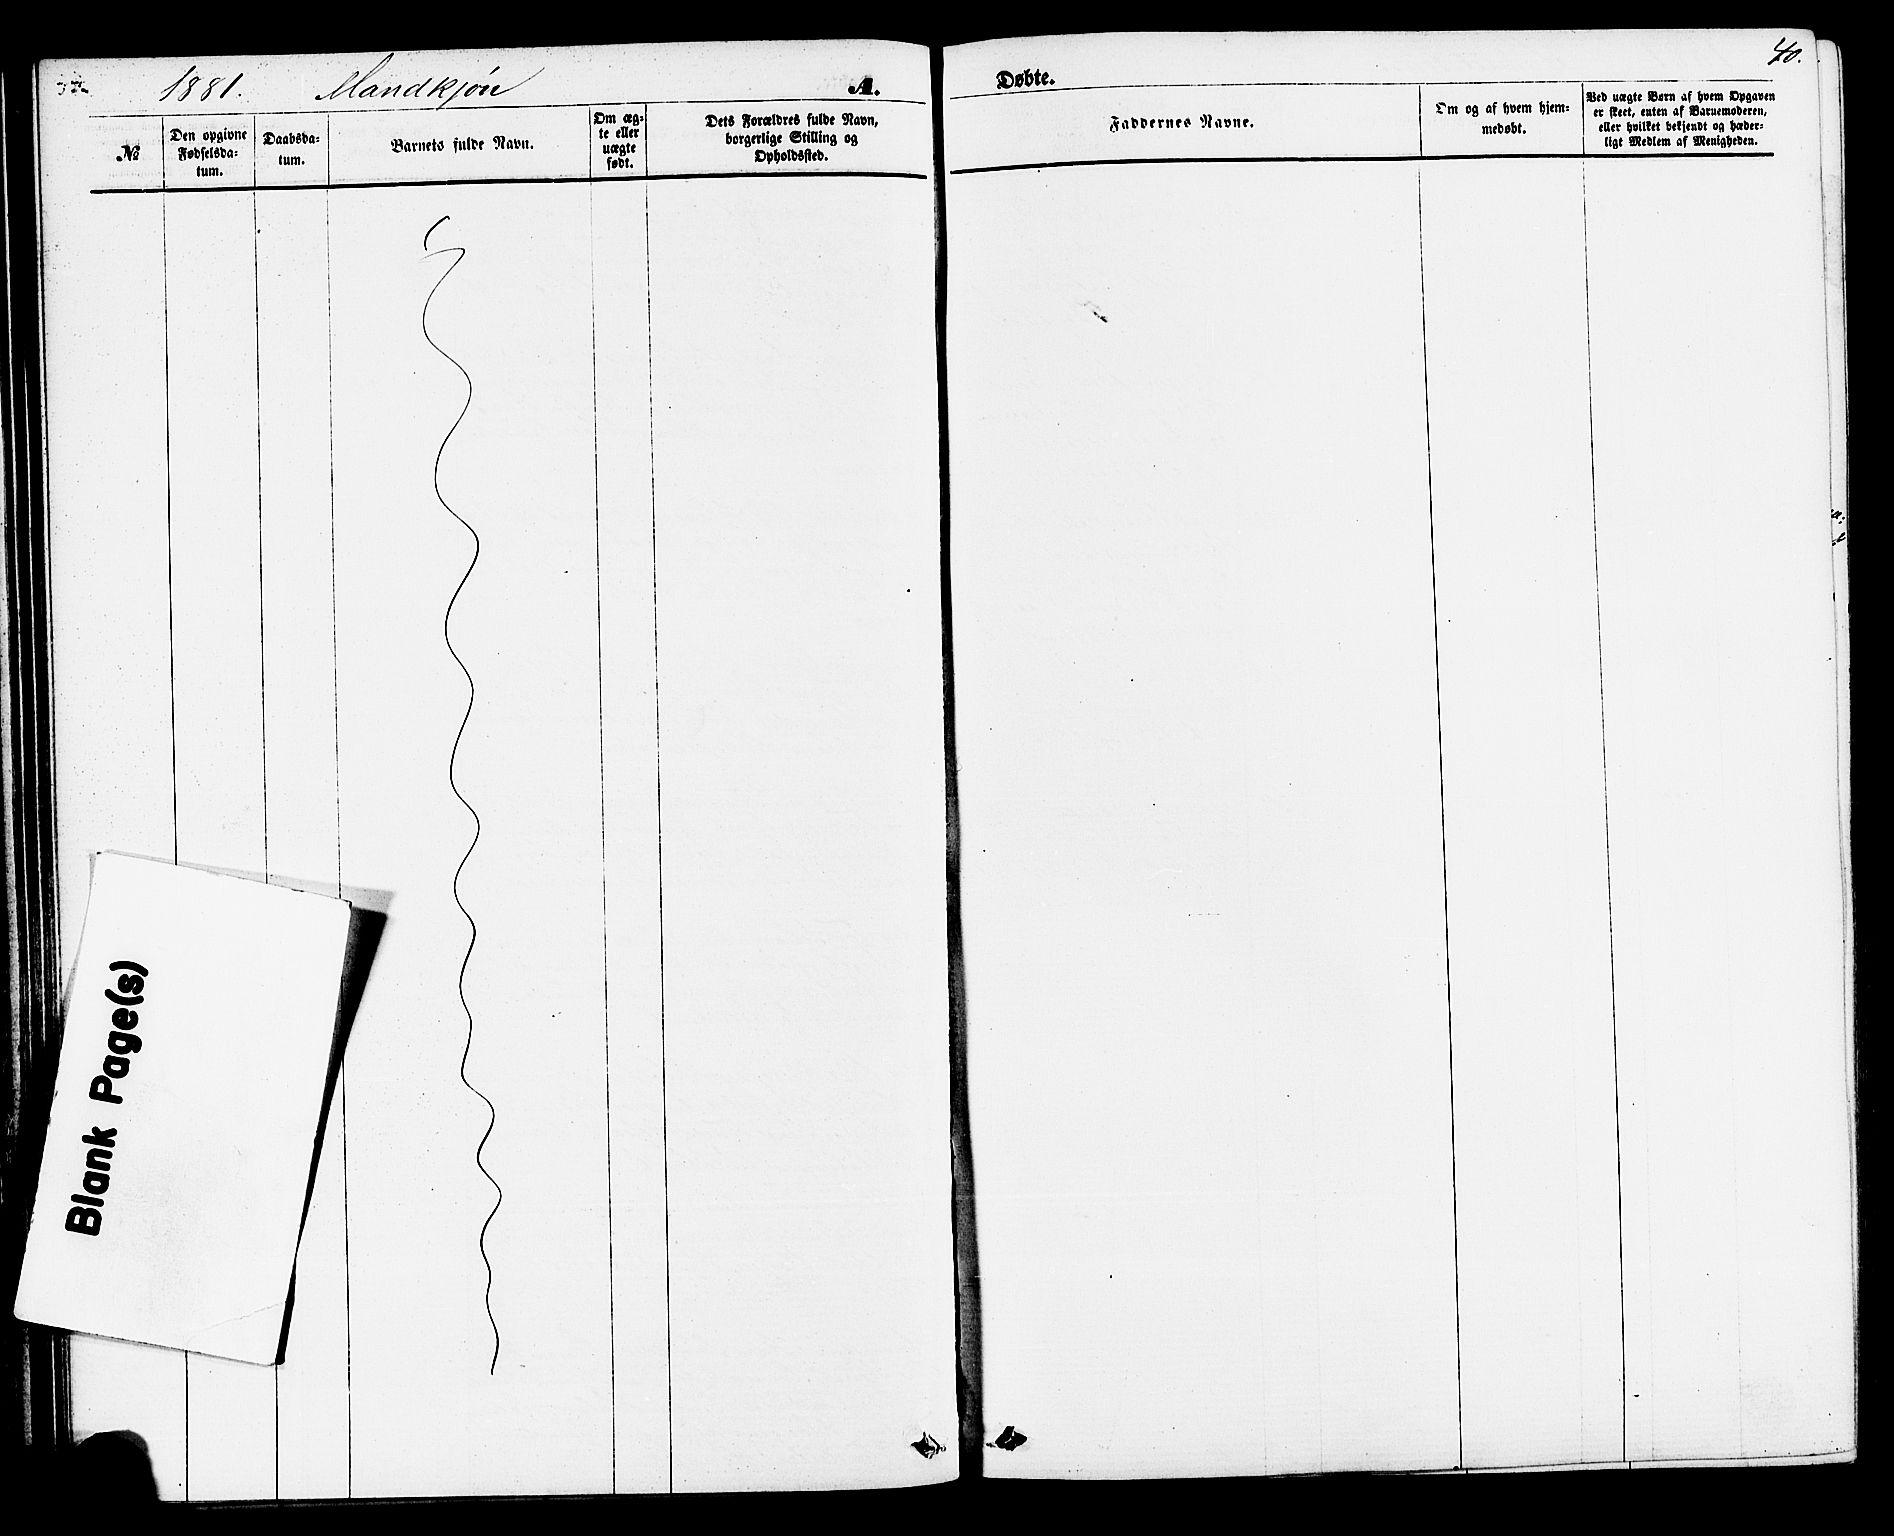 SAKO, Sauherad kirkebøker, F/Fa/L0008: Ministerialbok nr. I 8, 1873-1886, s. 40